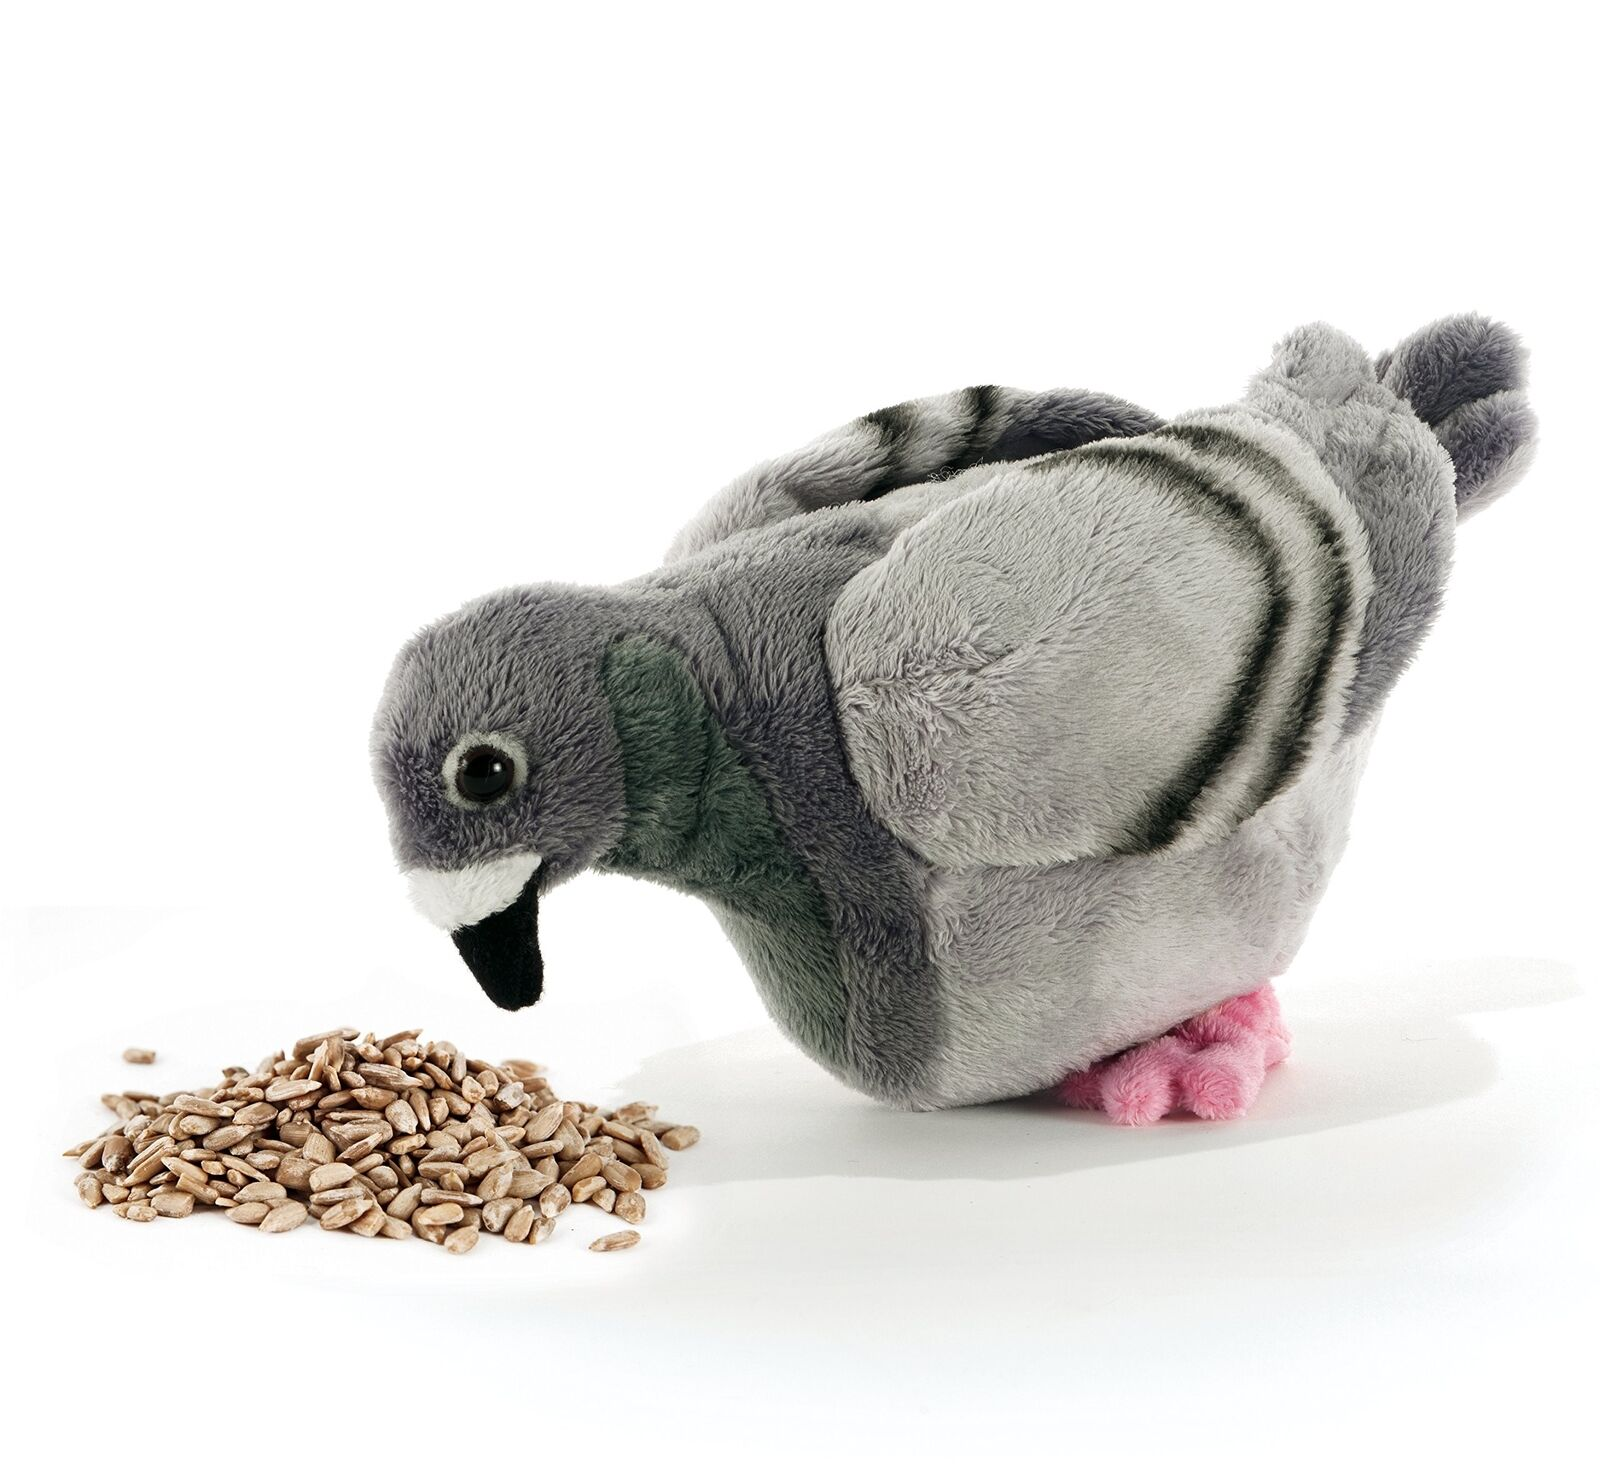 Plush & Company 15826 Farm Claude Le Pigeon Plush Toy, 23 cm, Multi-Farbe